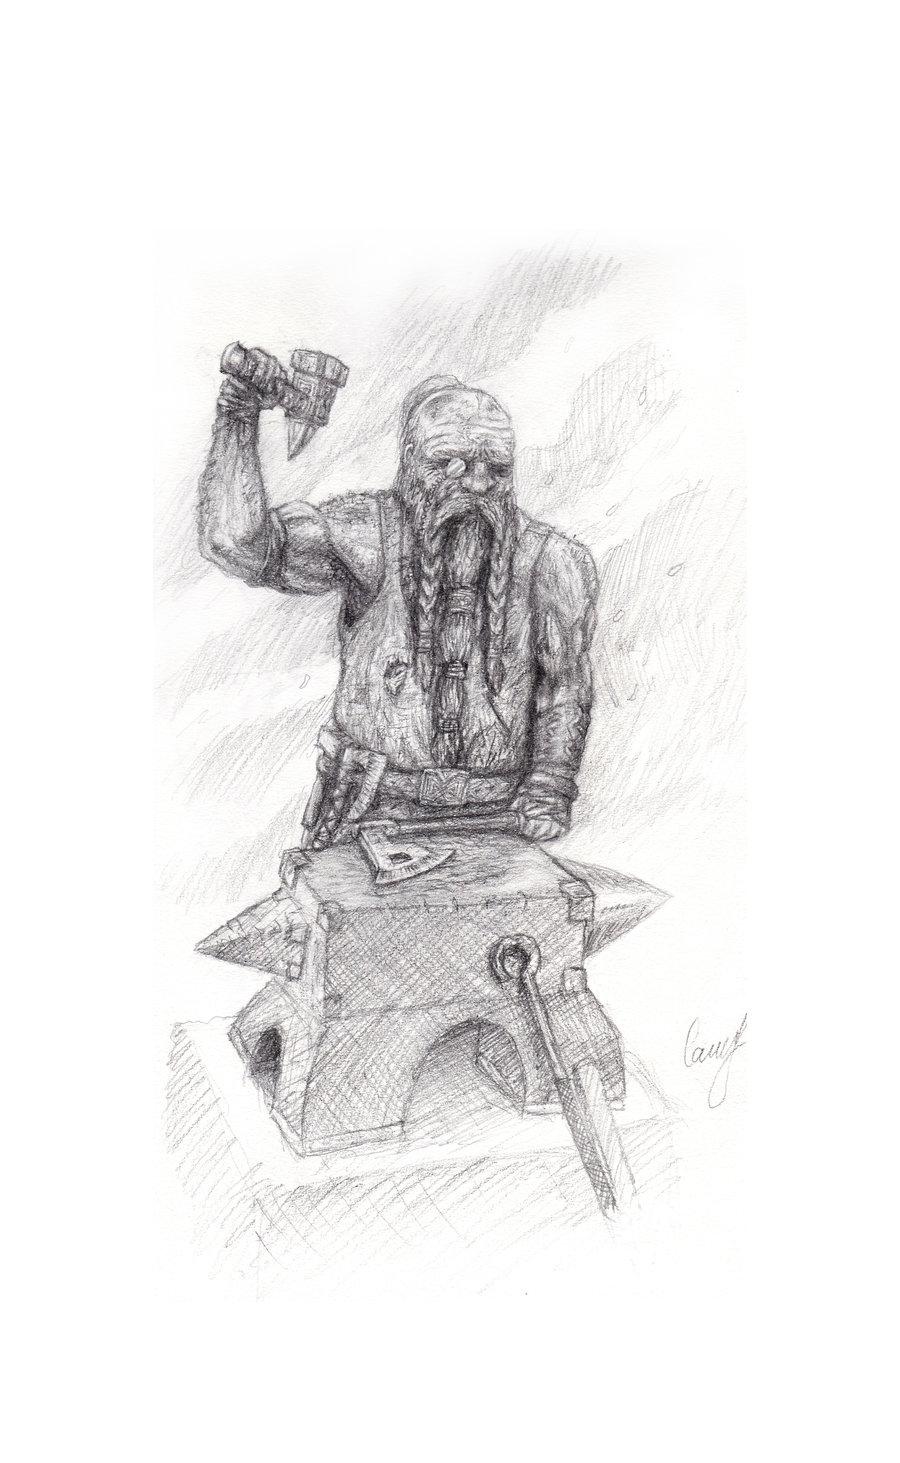 Drawn dwarf blacksmith Dwarven art art on by